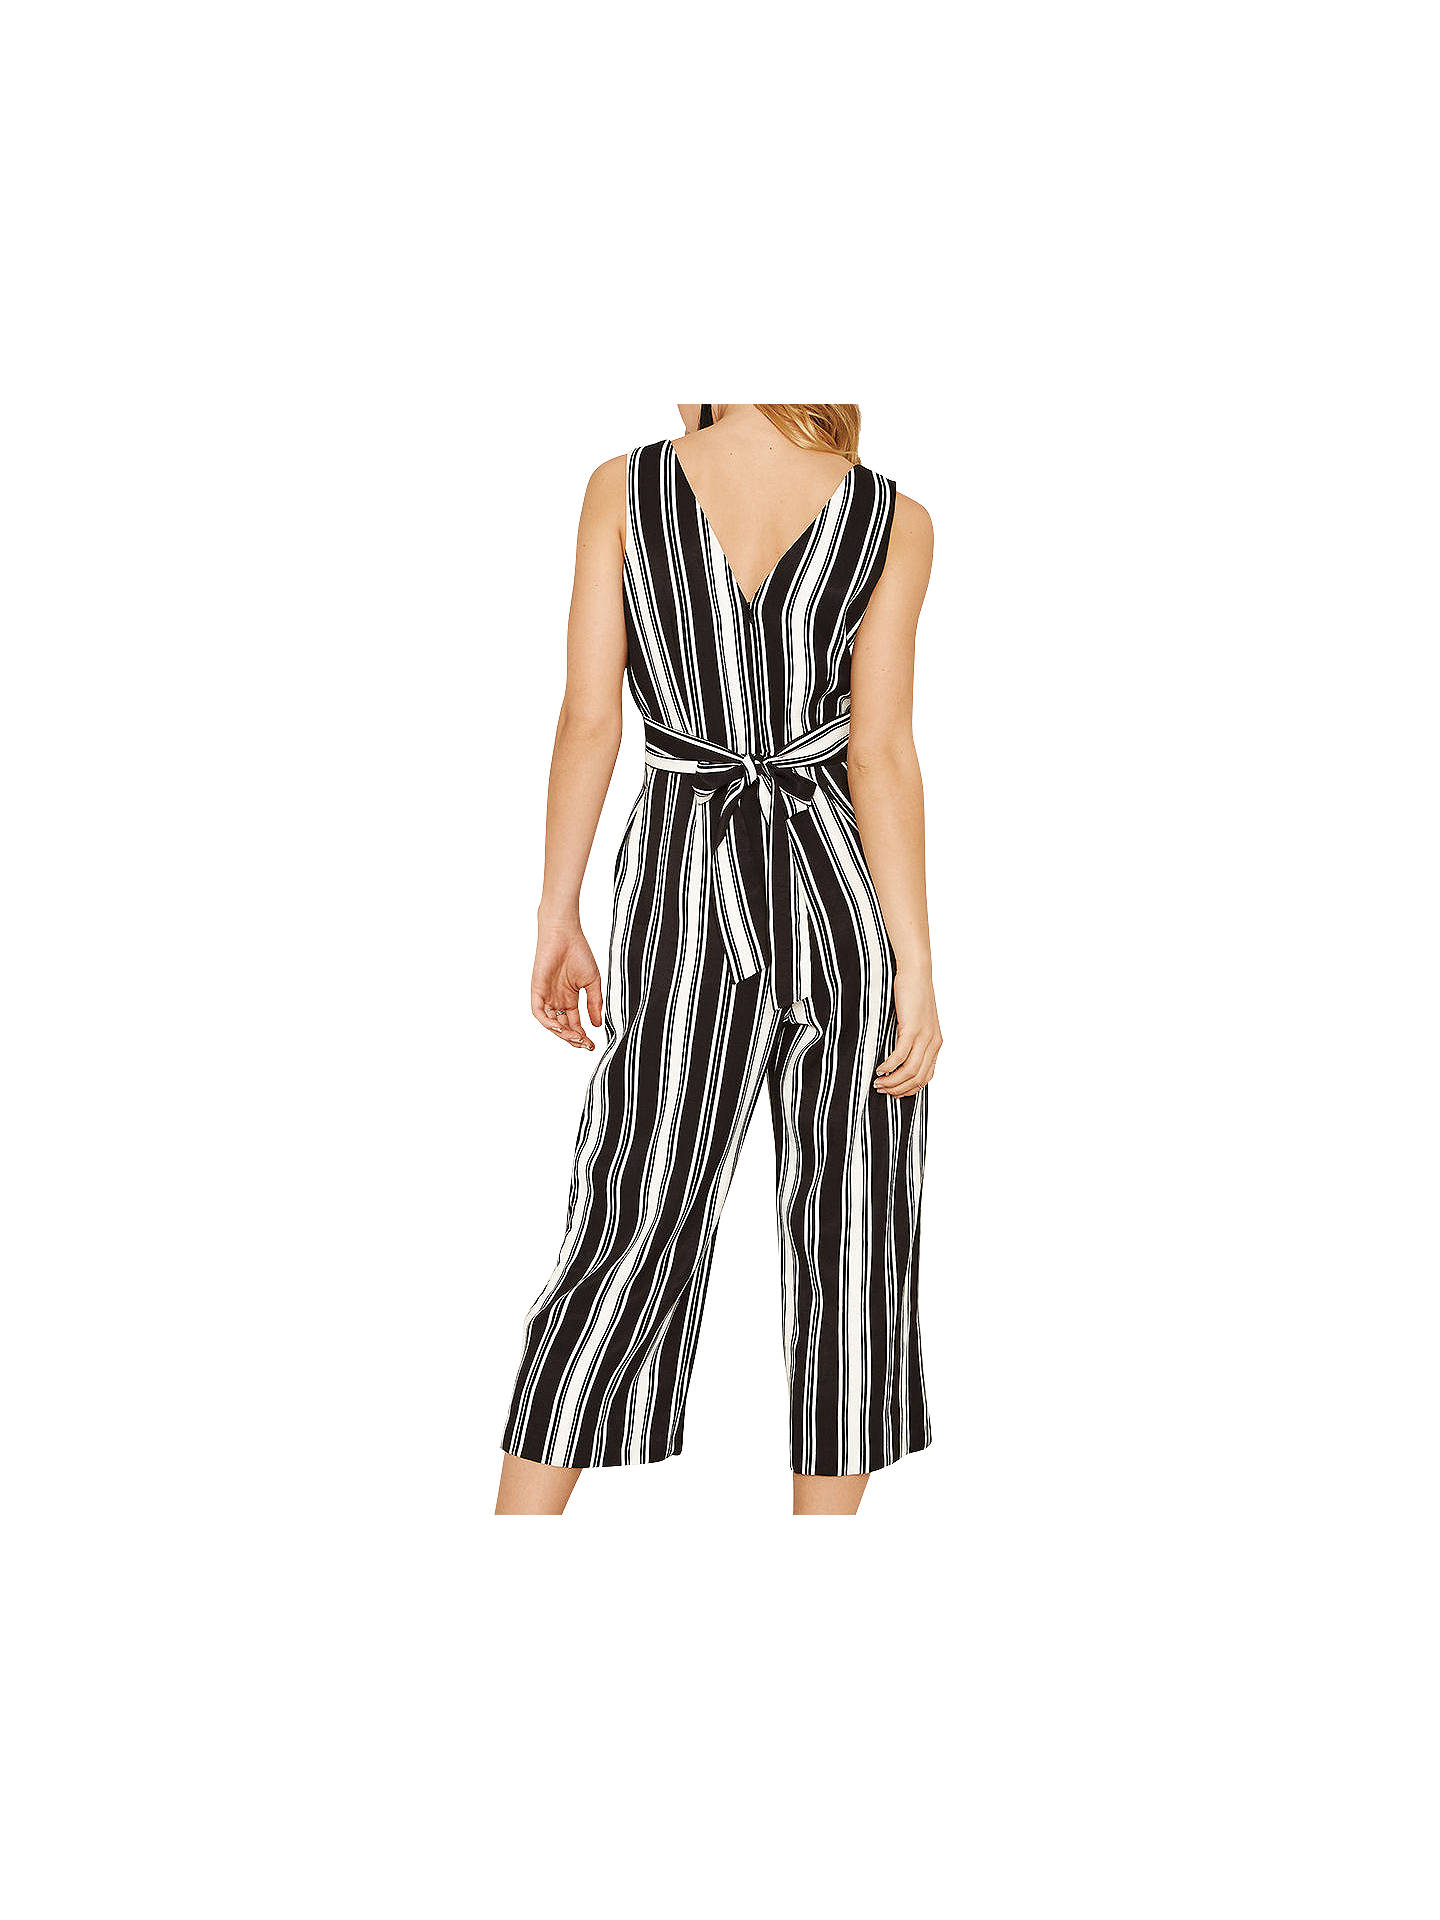 72a368131db ... Buy Oasis V-Neck Striped Jumpsuit